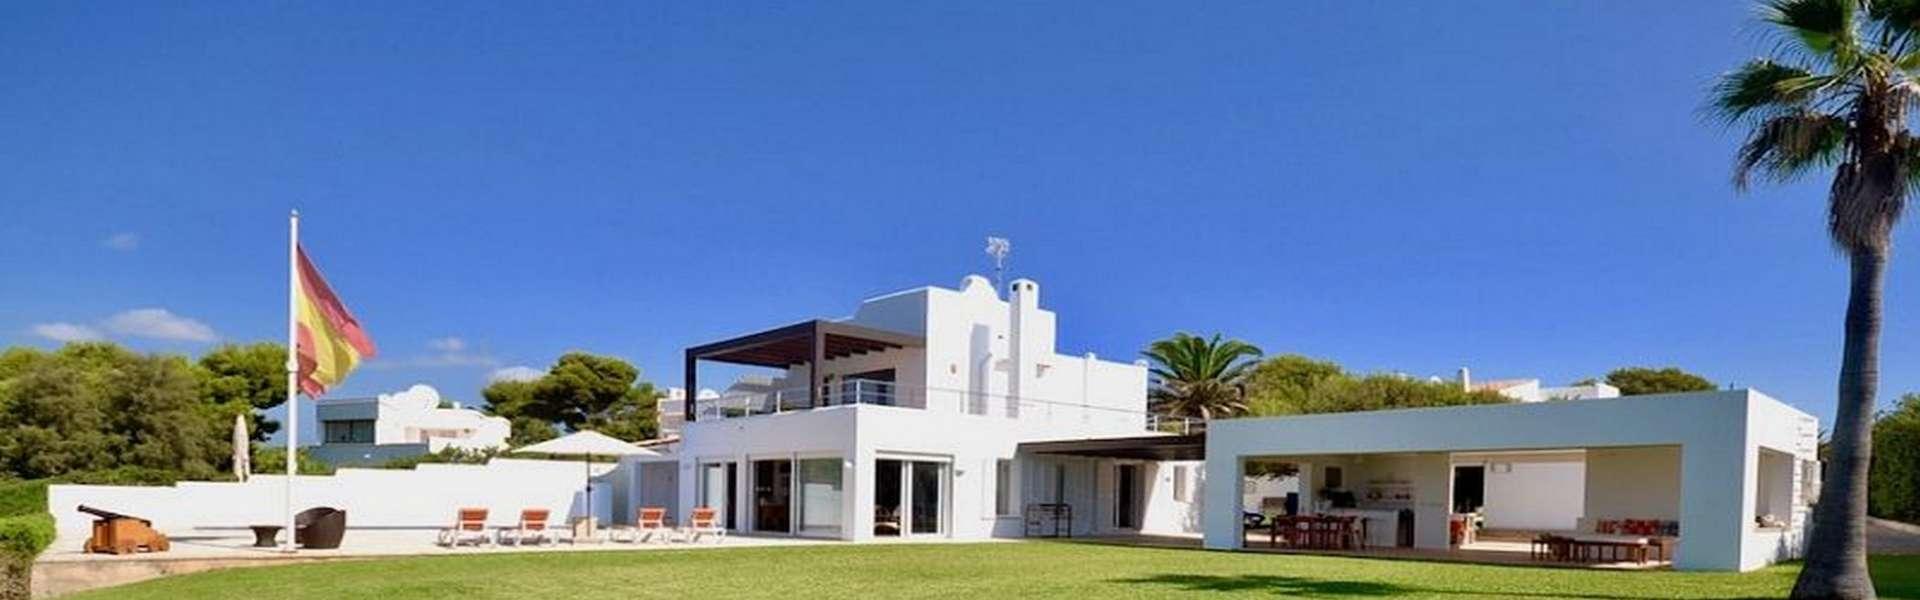 Villa in 1st sea line in Cala d'Or/Cala Egos